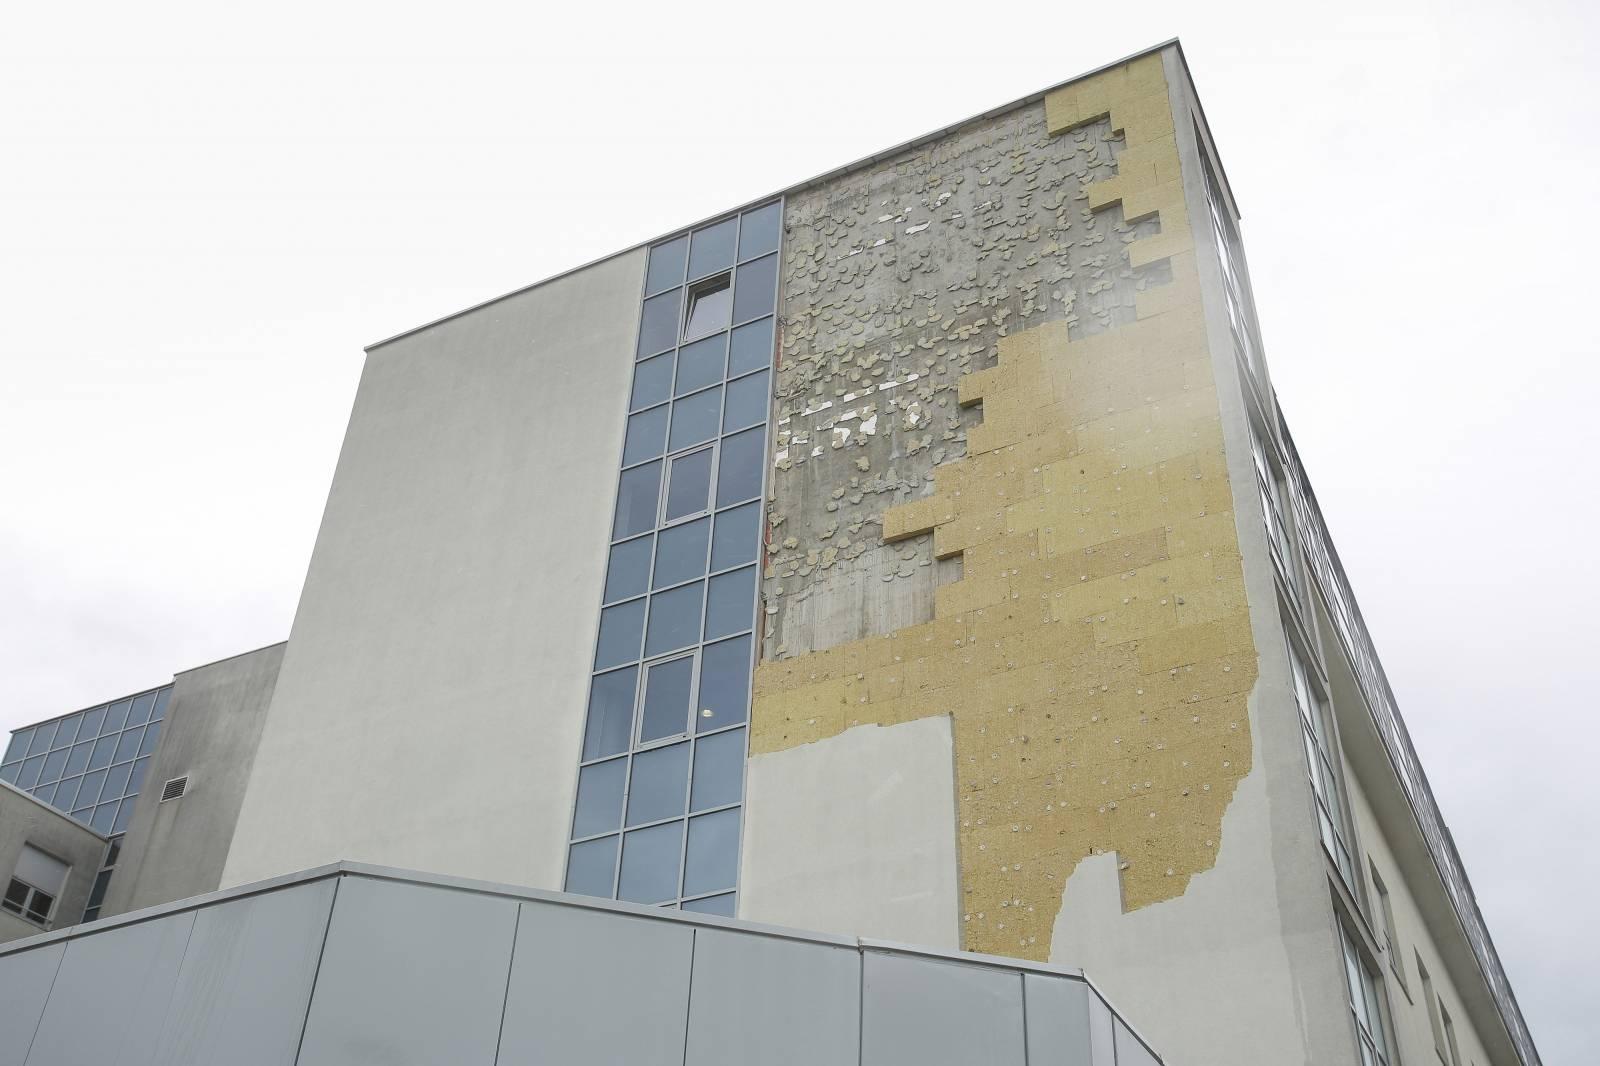 Zagreb: Udari olujnog vjetra noćas su odlomili ploče na fasadi zgrade KBC Zagreb - Rebro